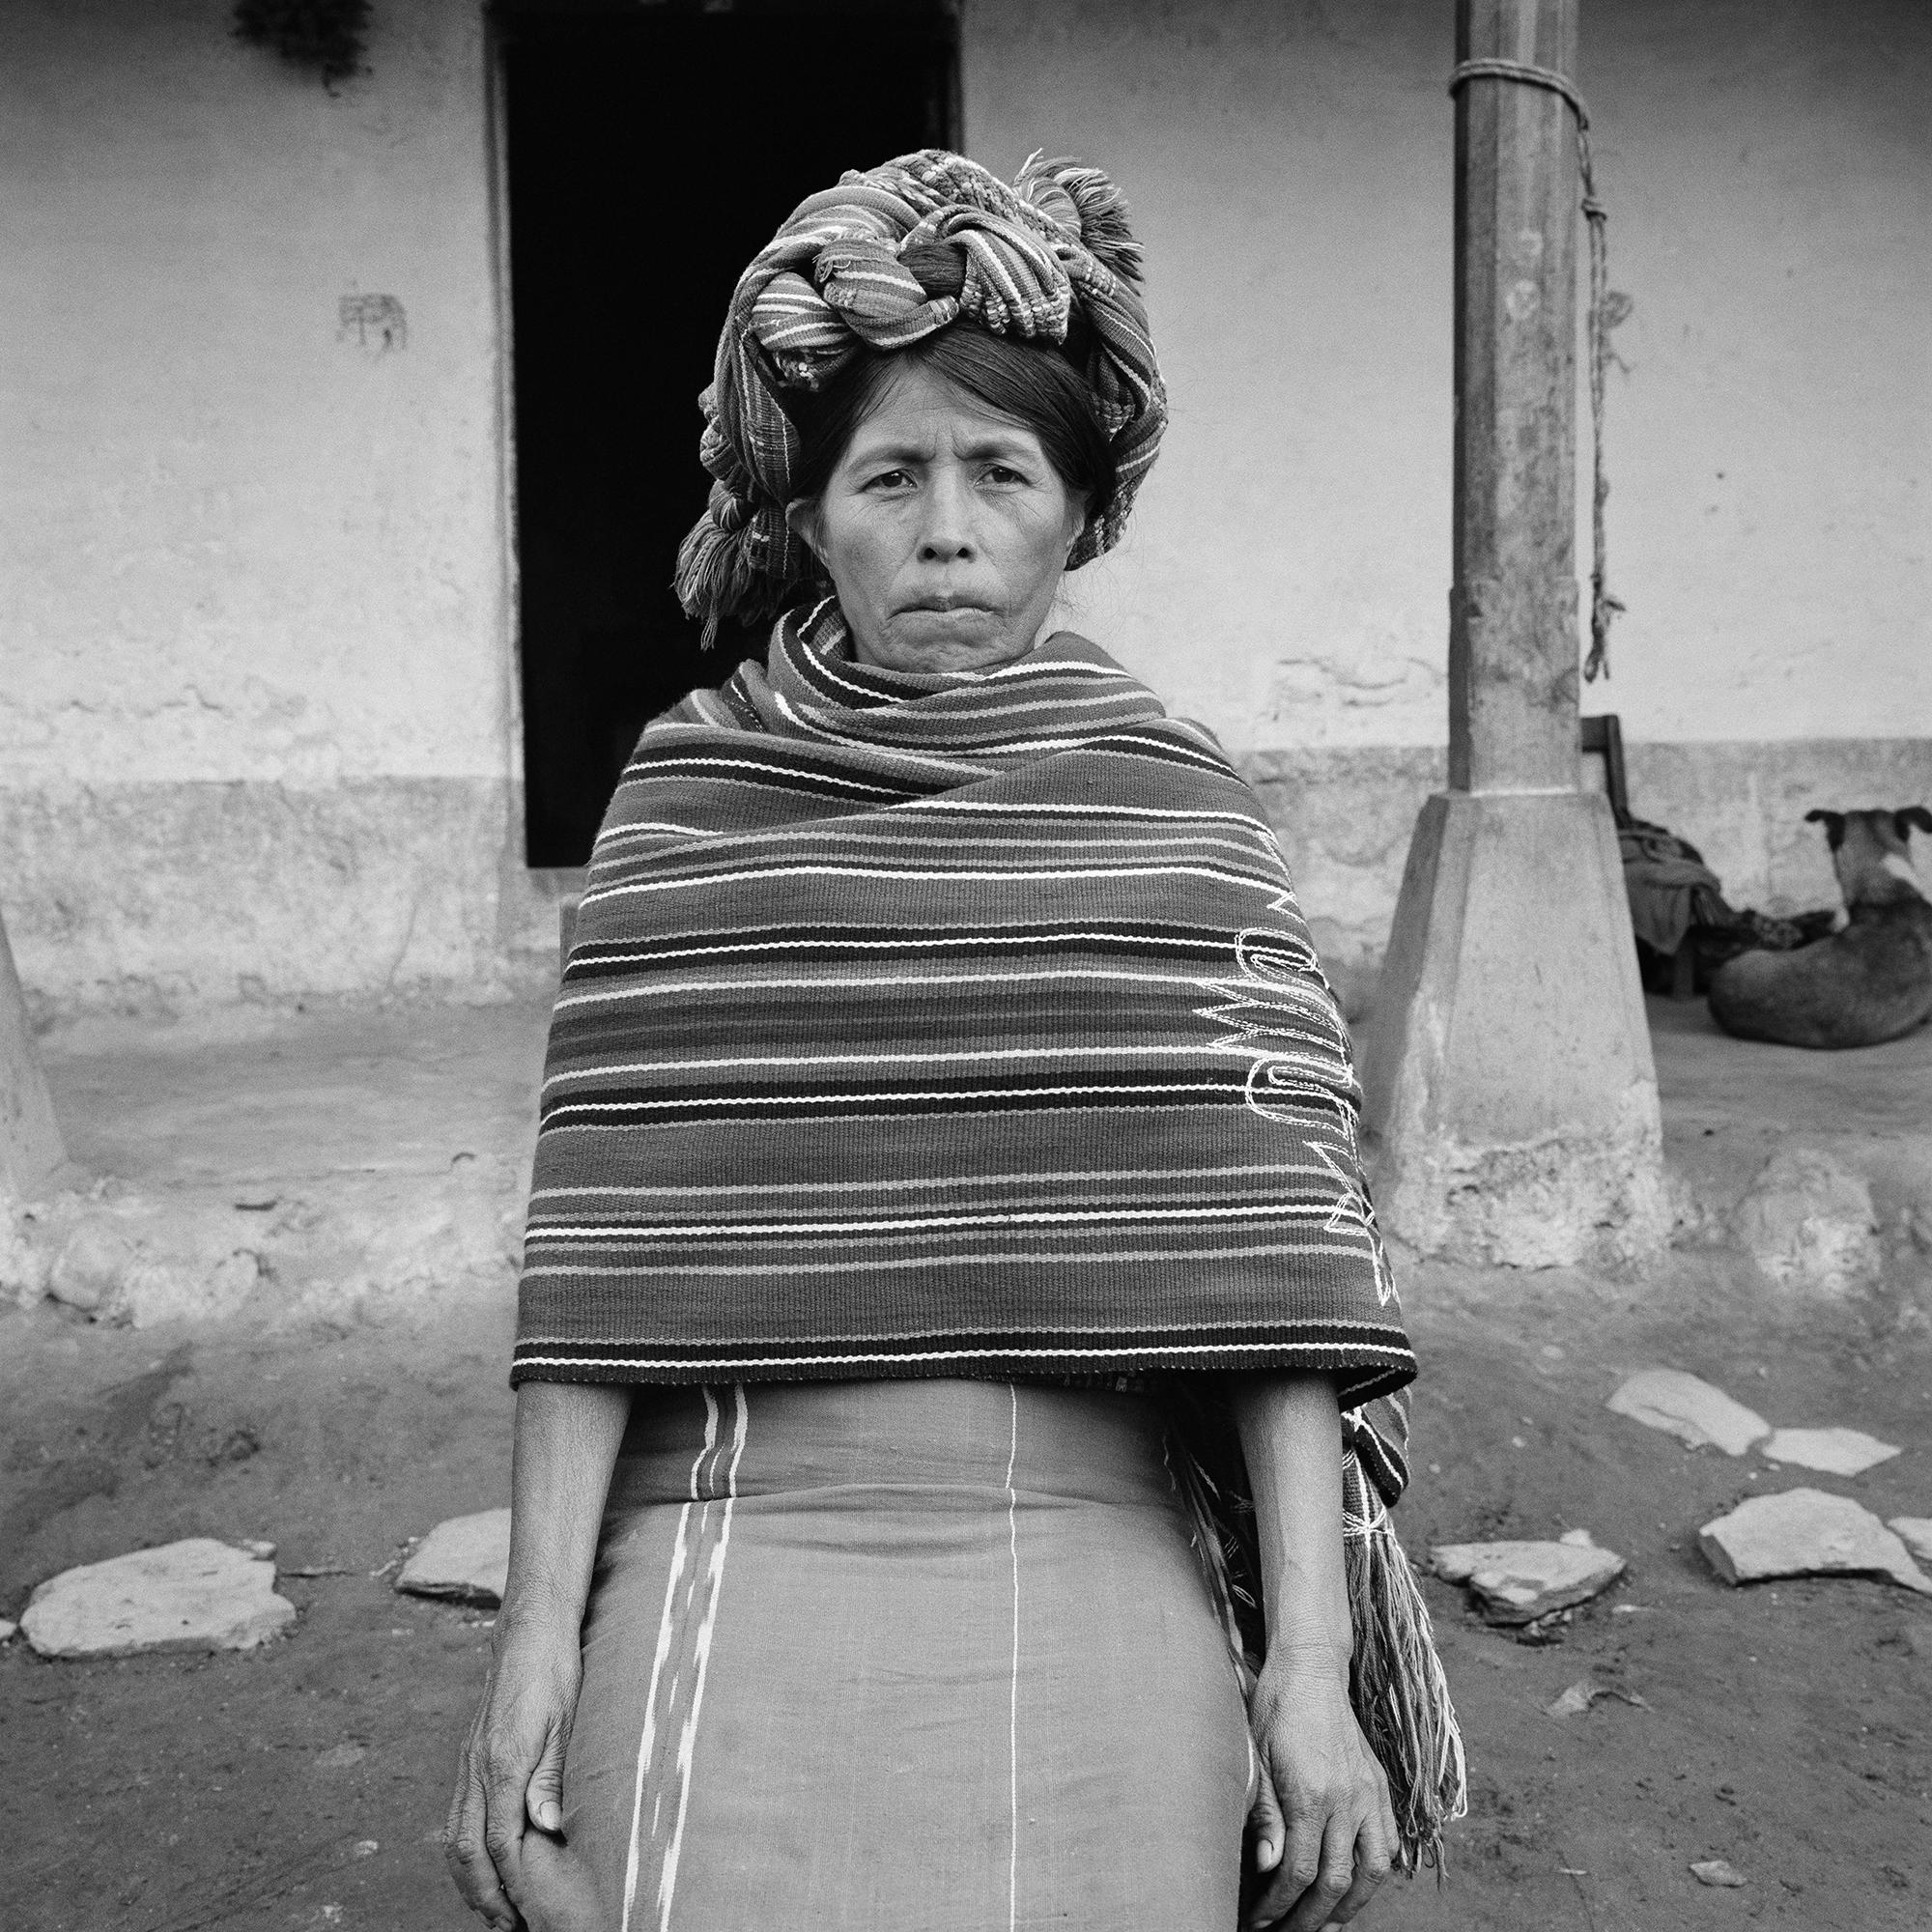 An Ixil Maya woman wearing a traditional head dress sits for a picture in Nebaj, Guatemala, January 1, 1984.